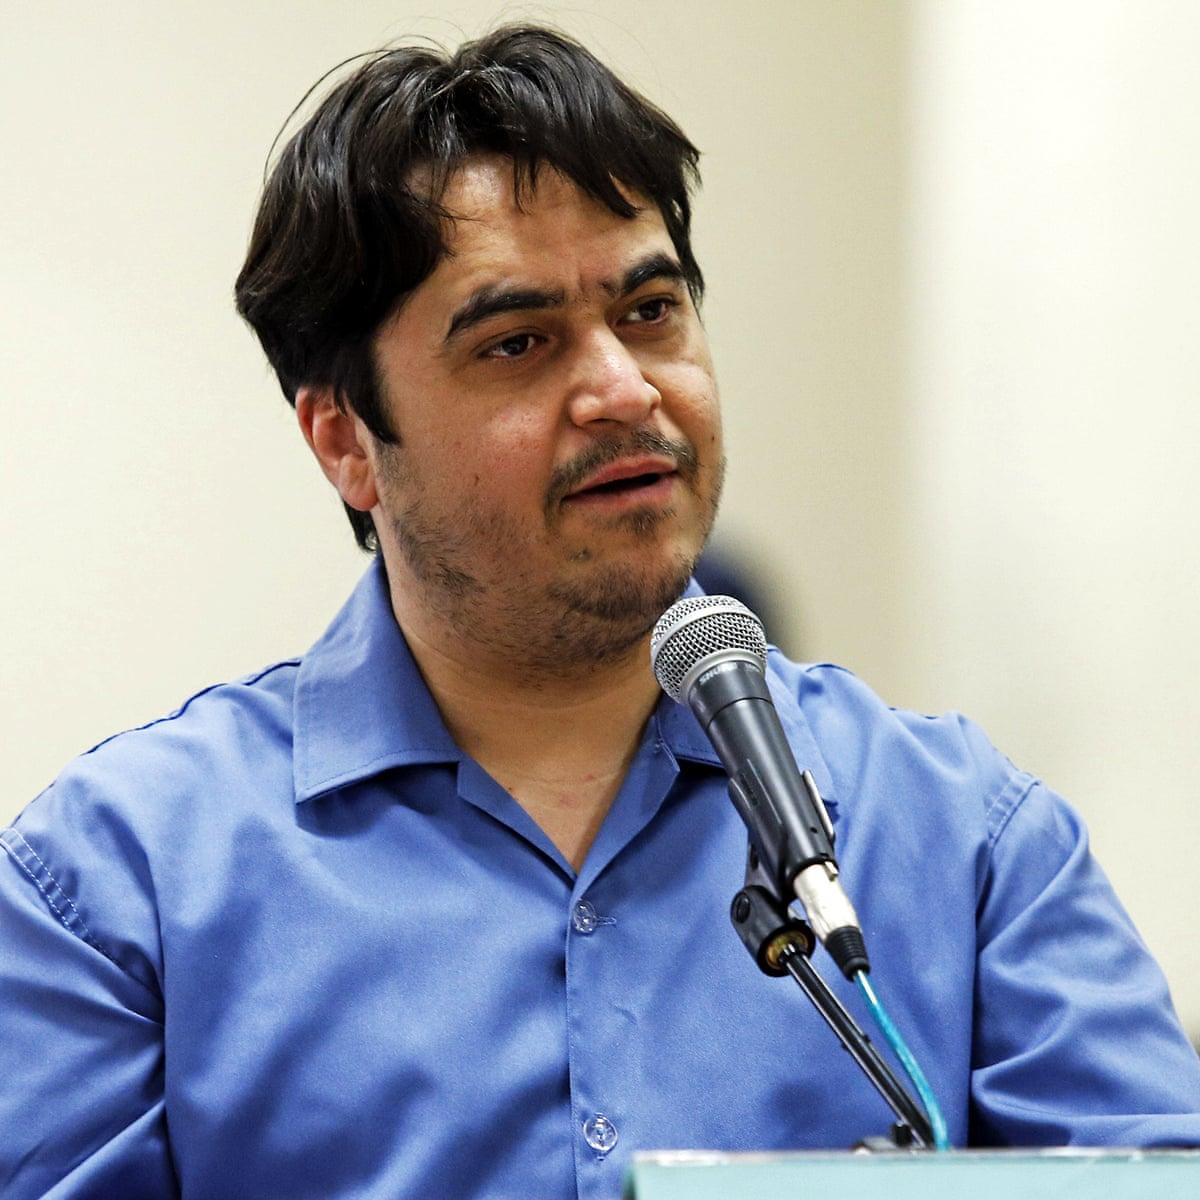 İran muhalif gazeteci Ruhullah Zam'ı idam etti, fransa, Mülteci AmadNews,